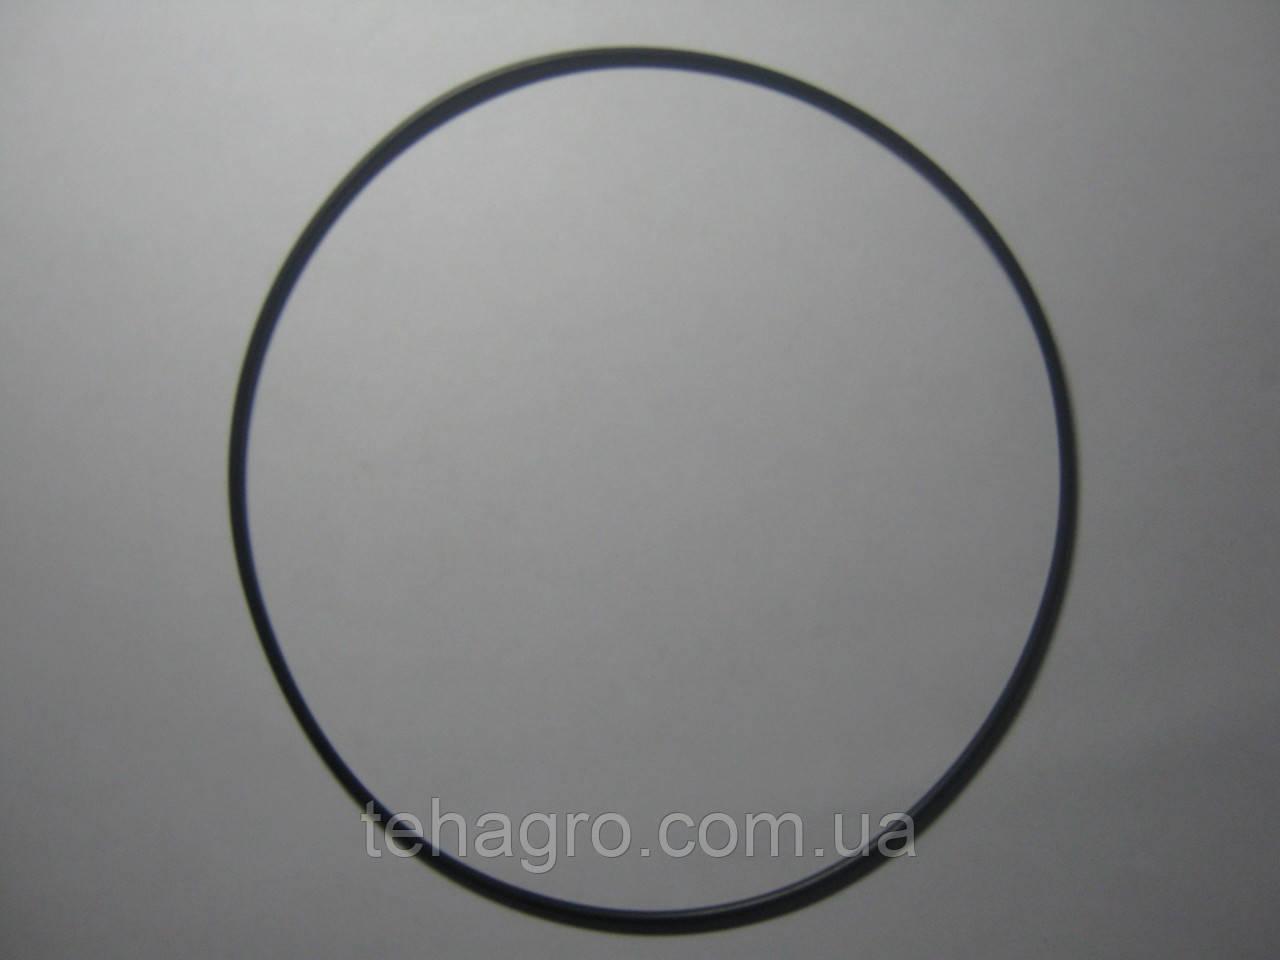 Кольцо уплотнительное (кільце ущільнююче) 145,72*2,62